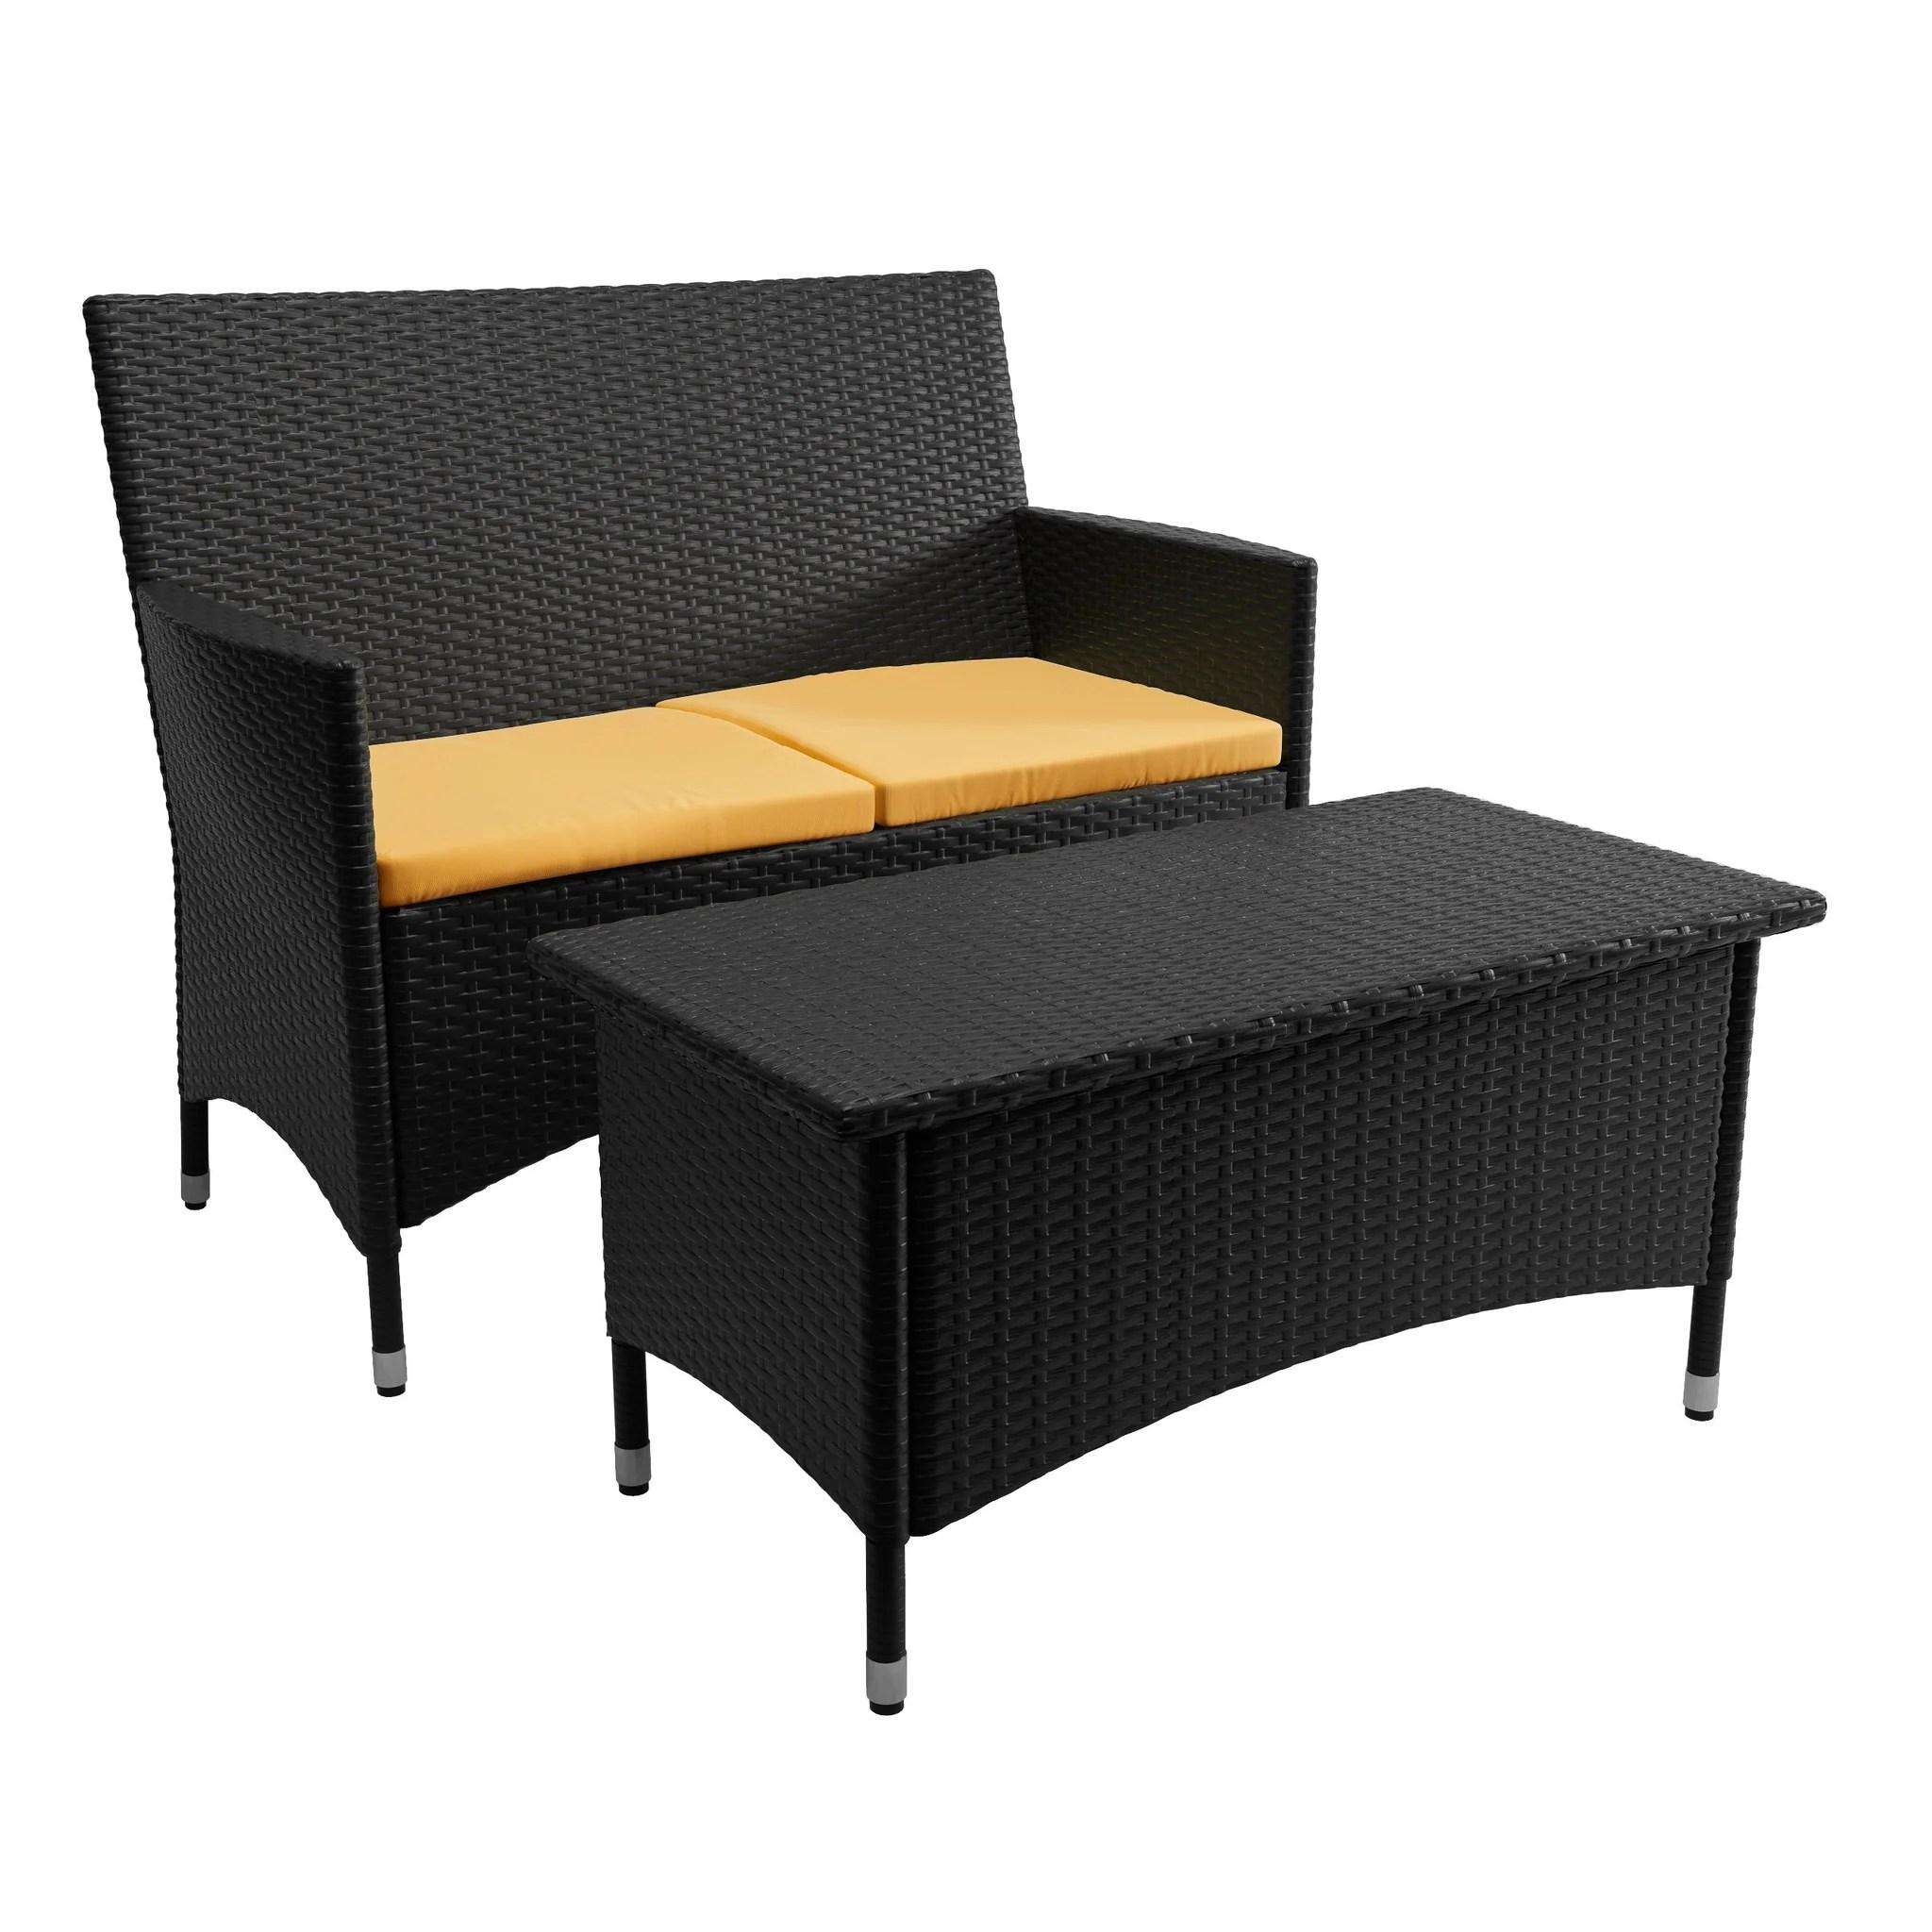 cascade patio sofa and coffee table clearance final sale